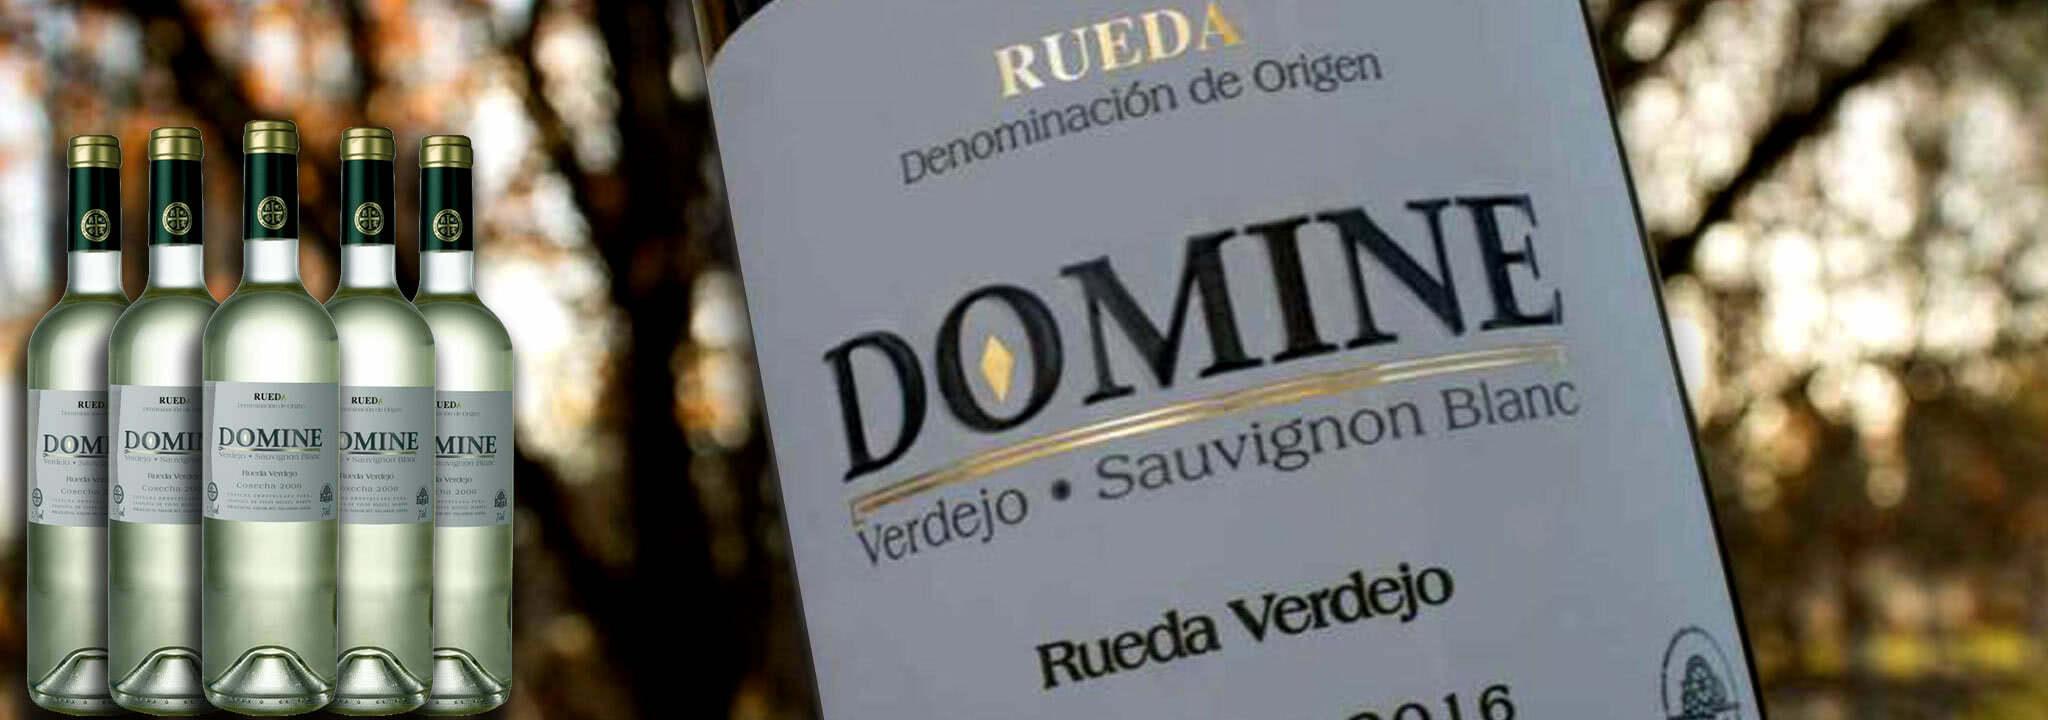 Domine Verdejo Joven D.O. Rueda